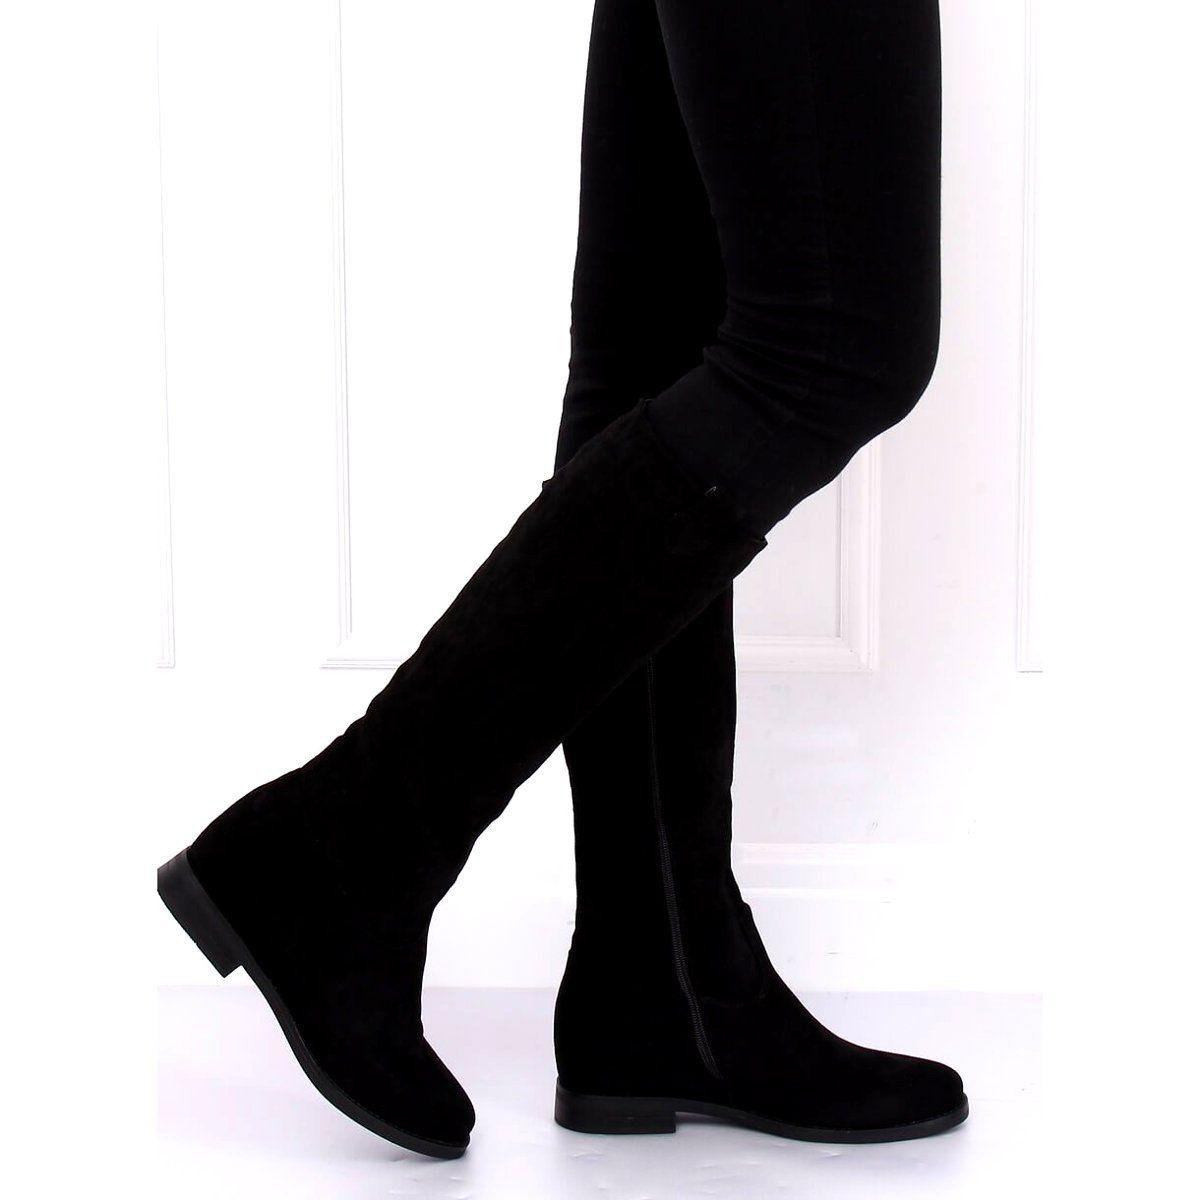 Kozaki Na Ukrytym Koturnie Czarne Nc968p Black Boots Womens Boots Fashion Cowboy Boots